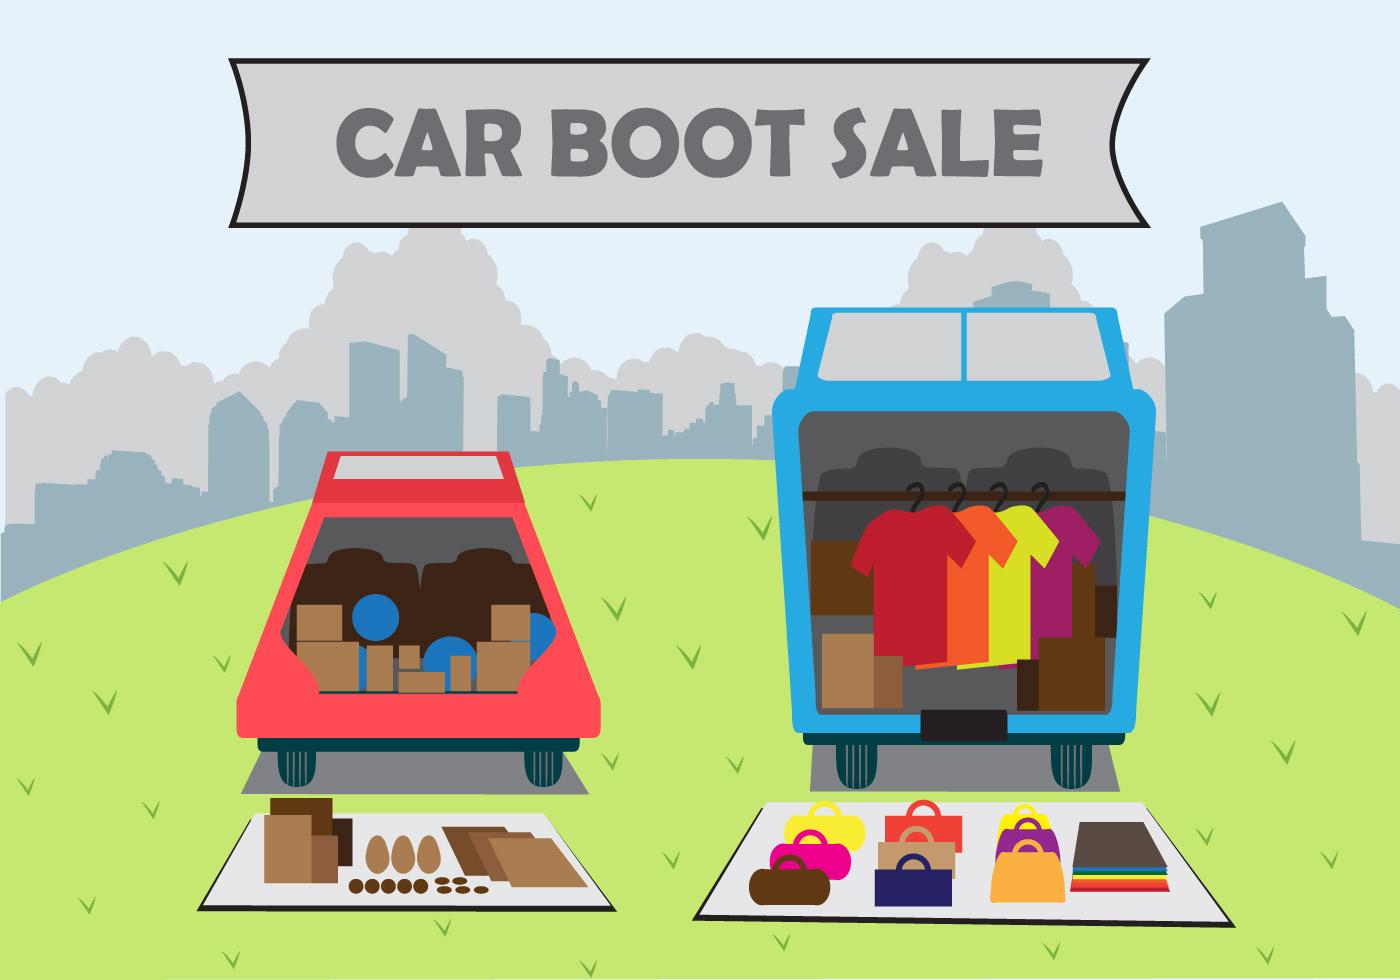 Illustration Car Boot Sale Download Free Vectors